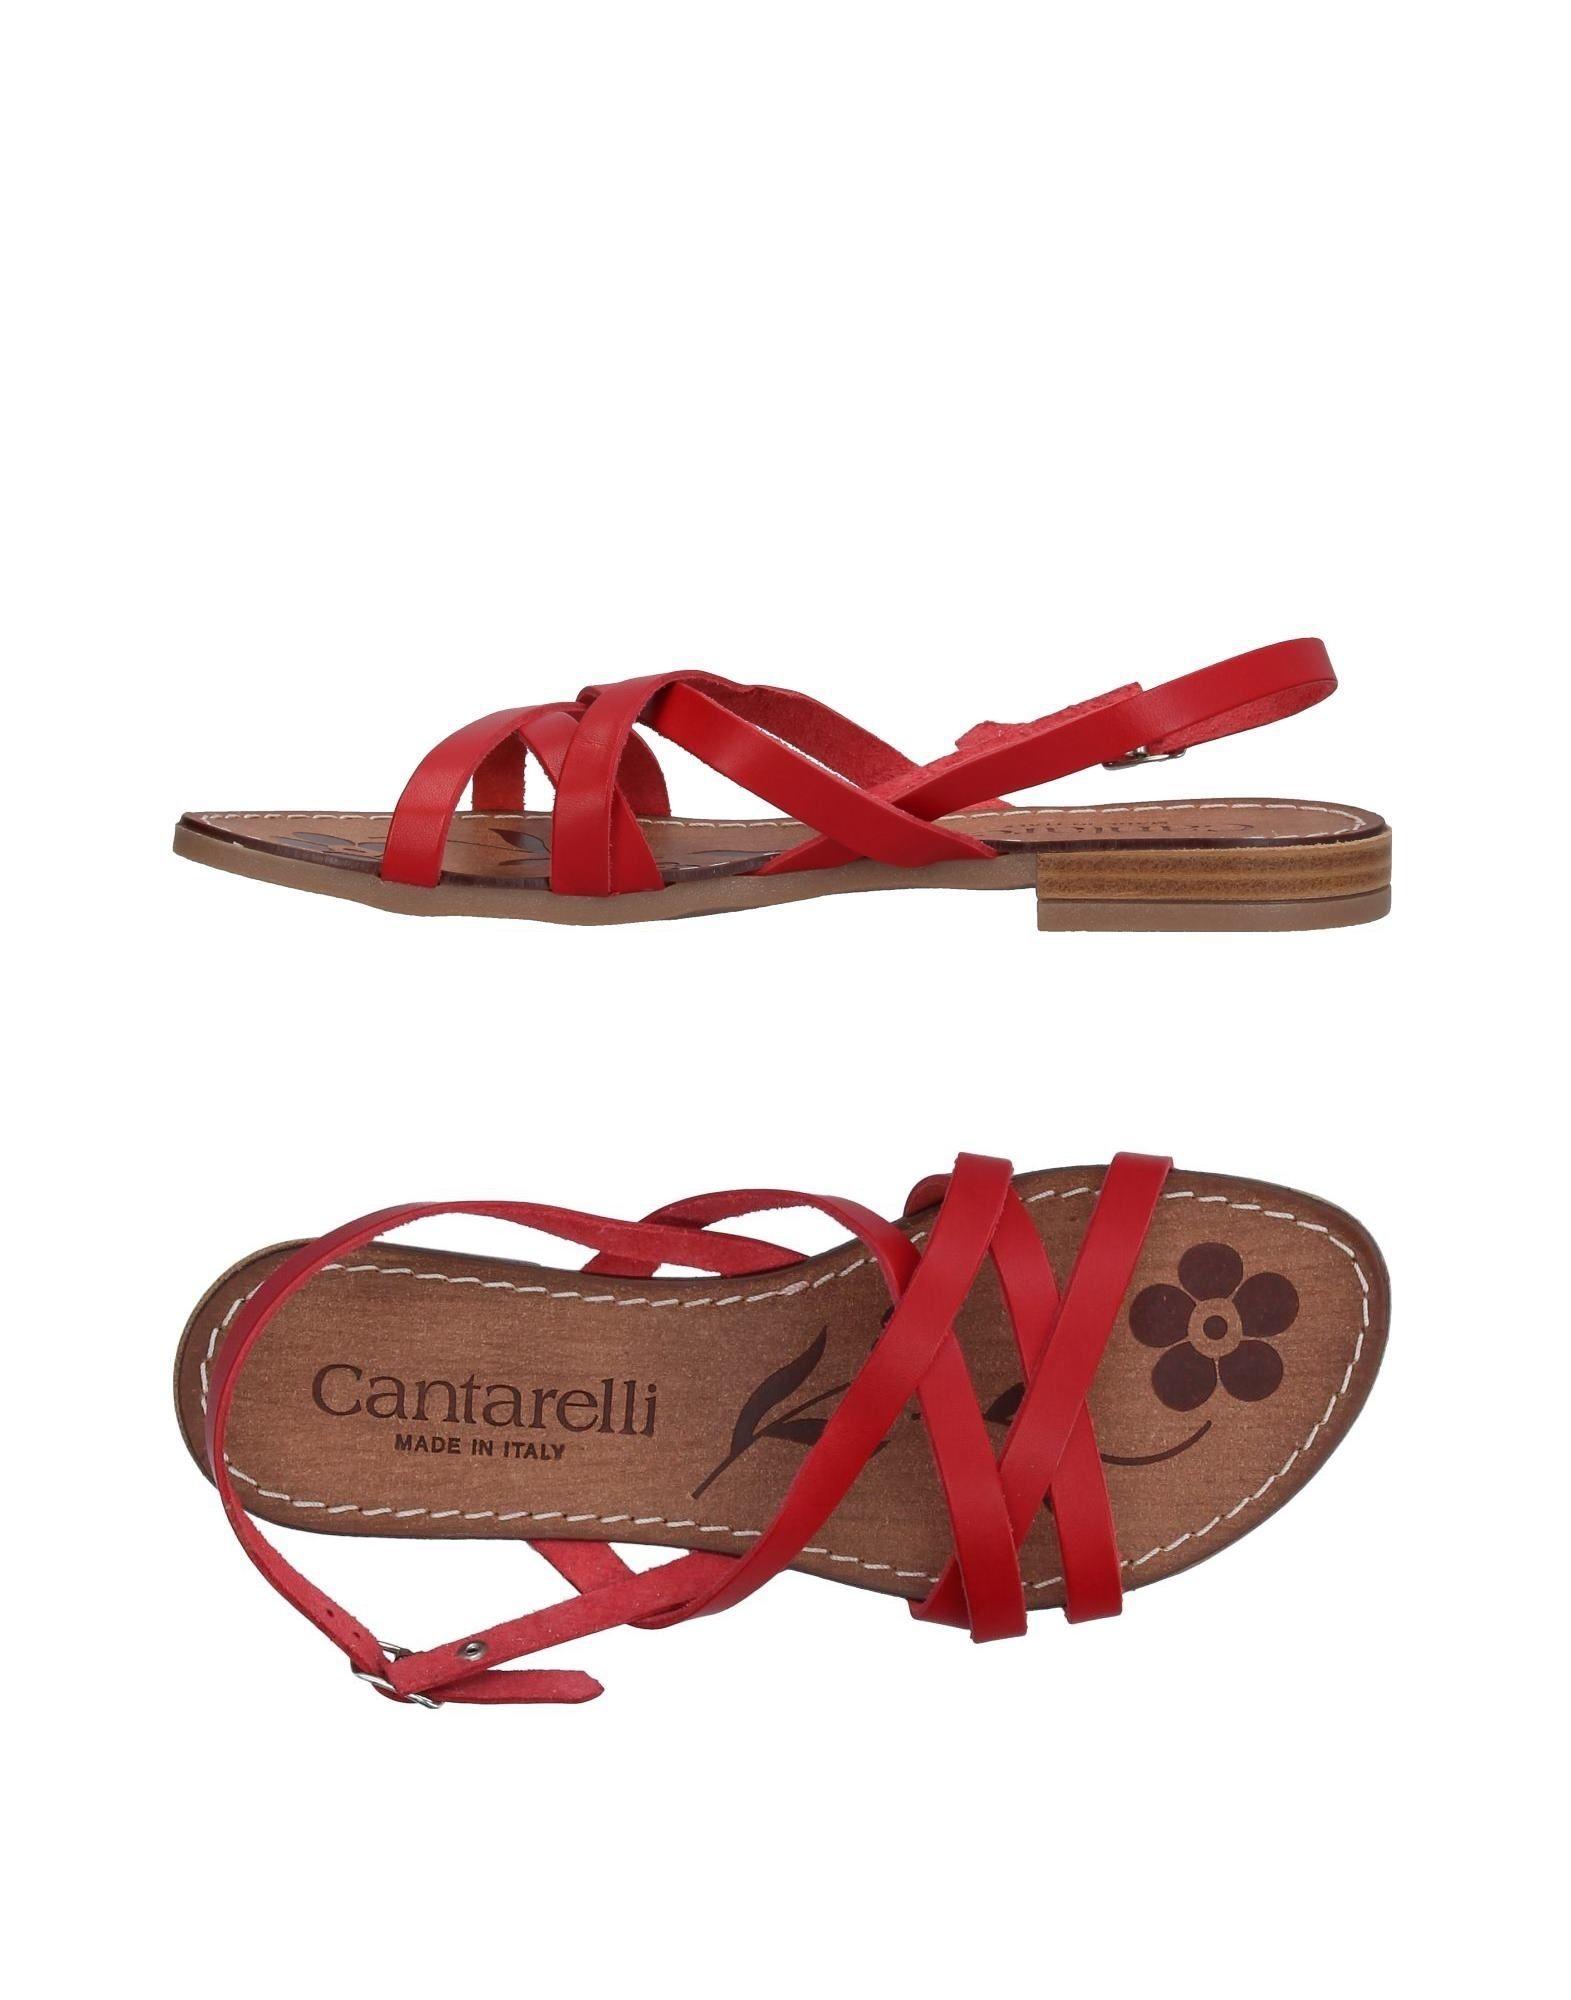 Sandales Cantarelli Femme - Sandales Cantarelli sur